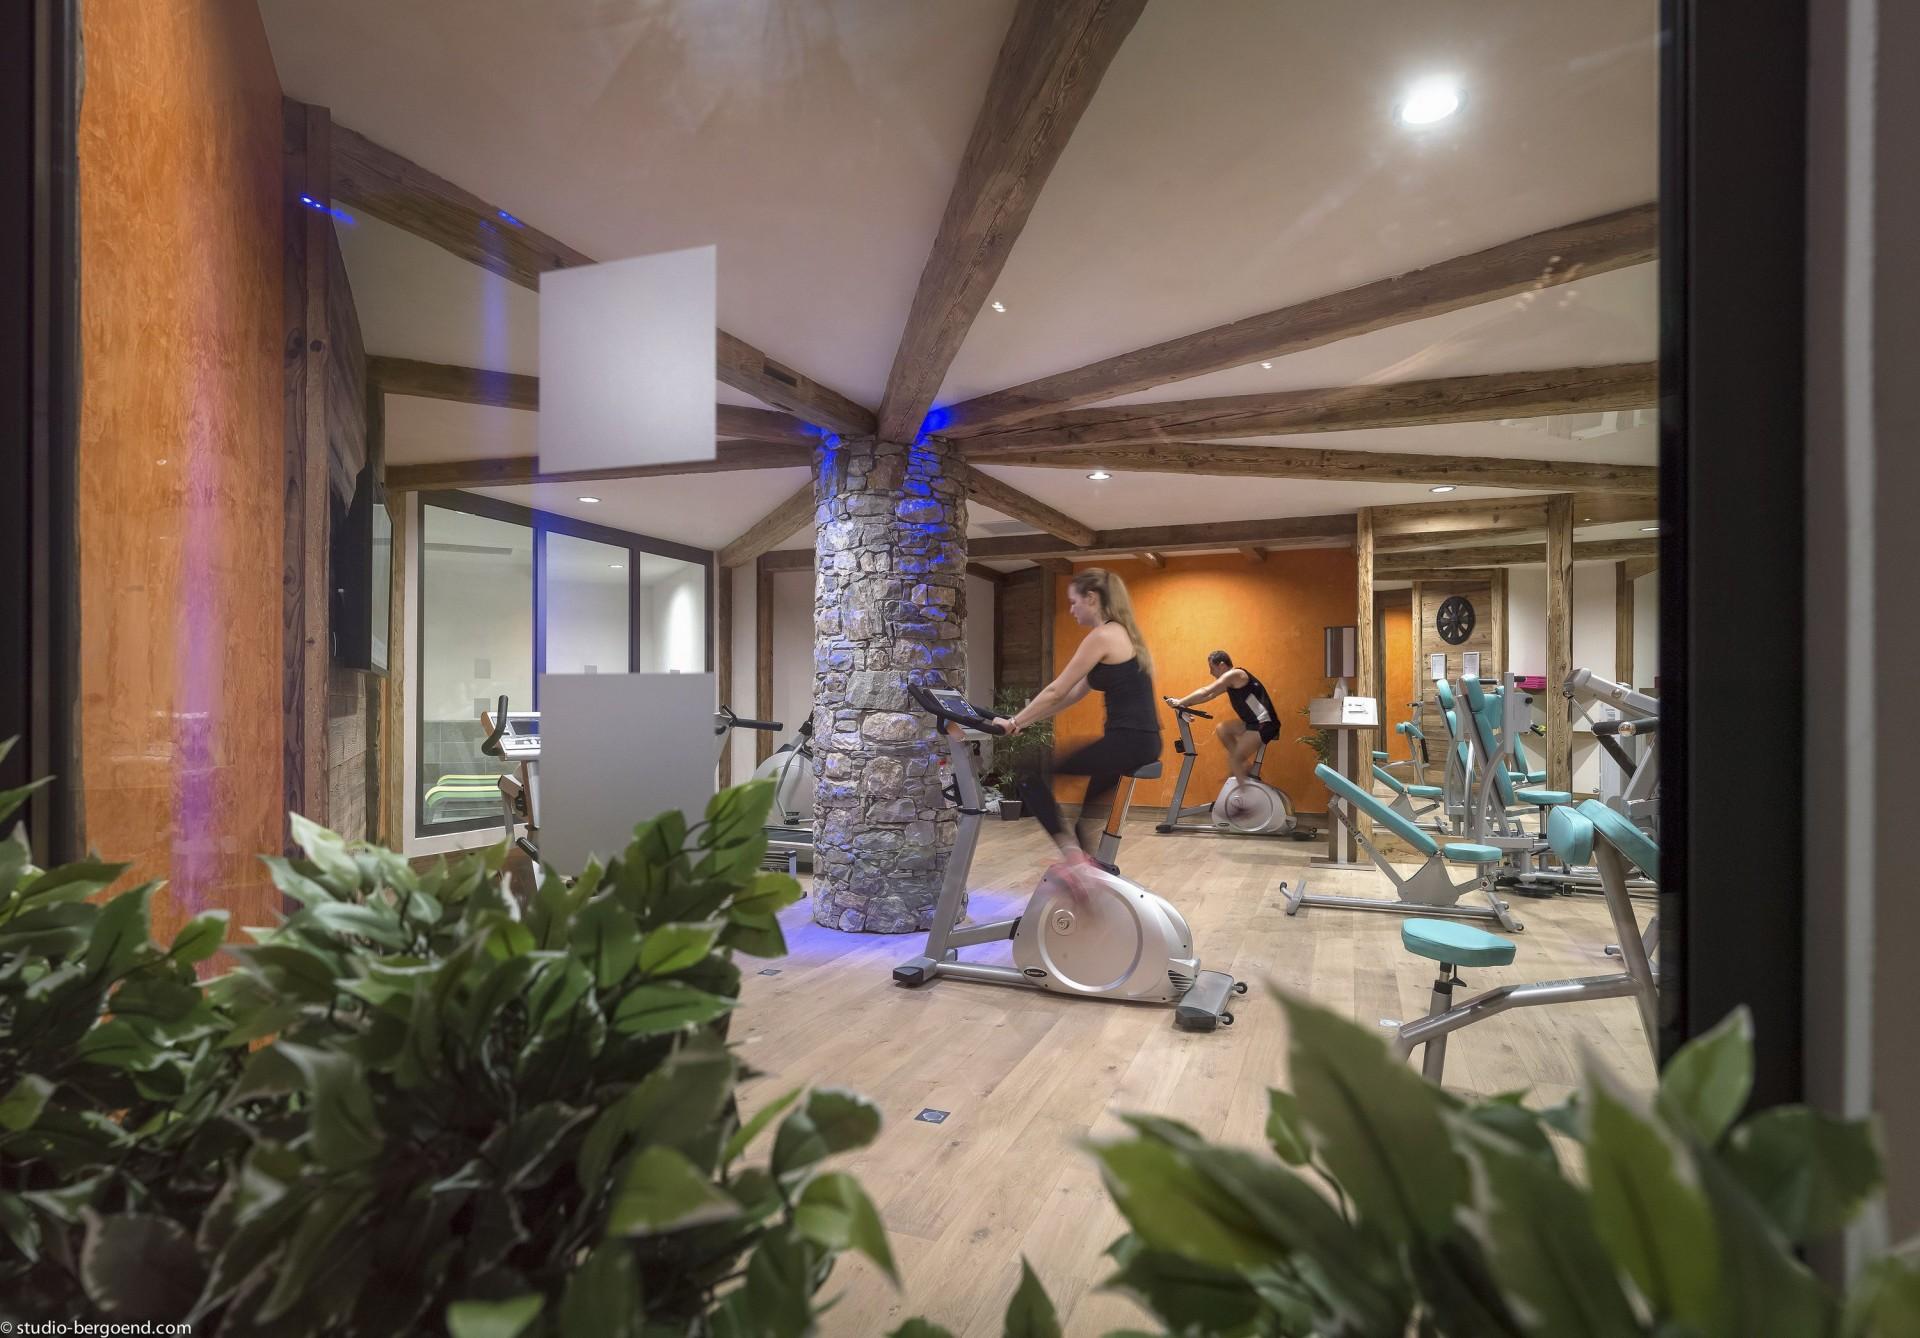 Tignes Location Appartement Luxe Micata Salle De Fitness